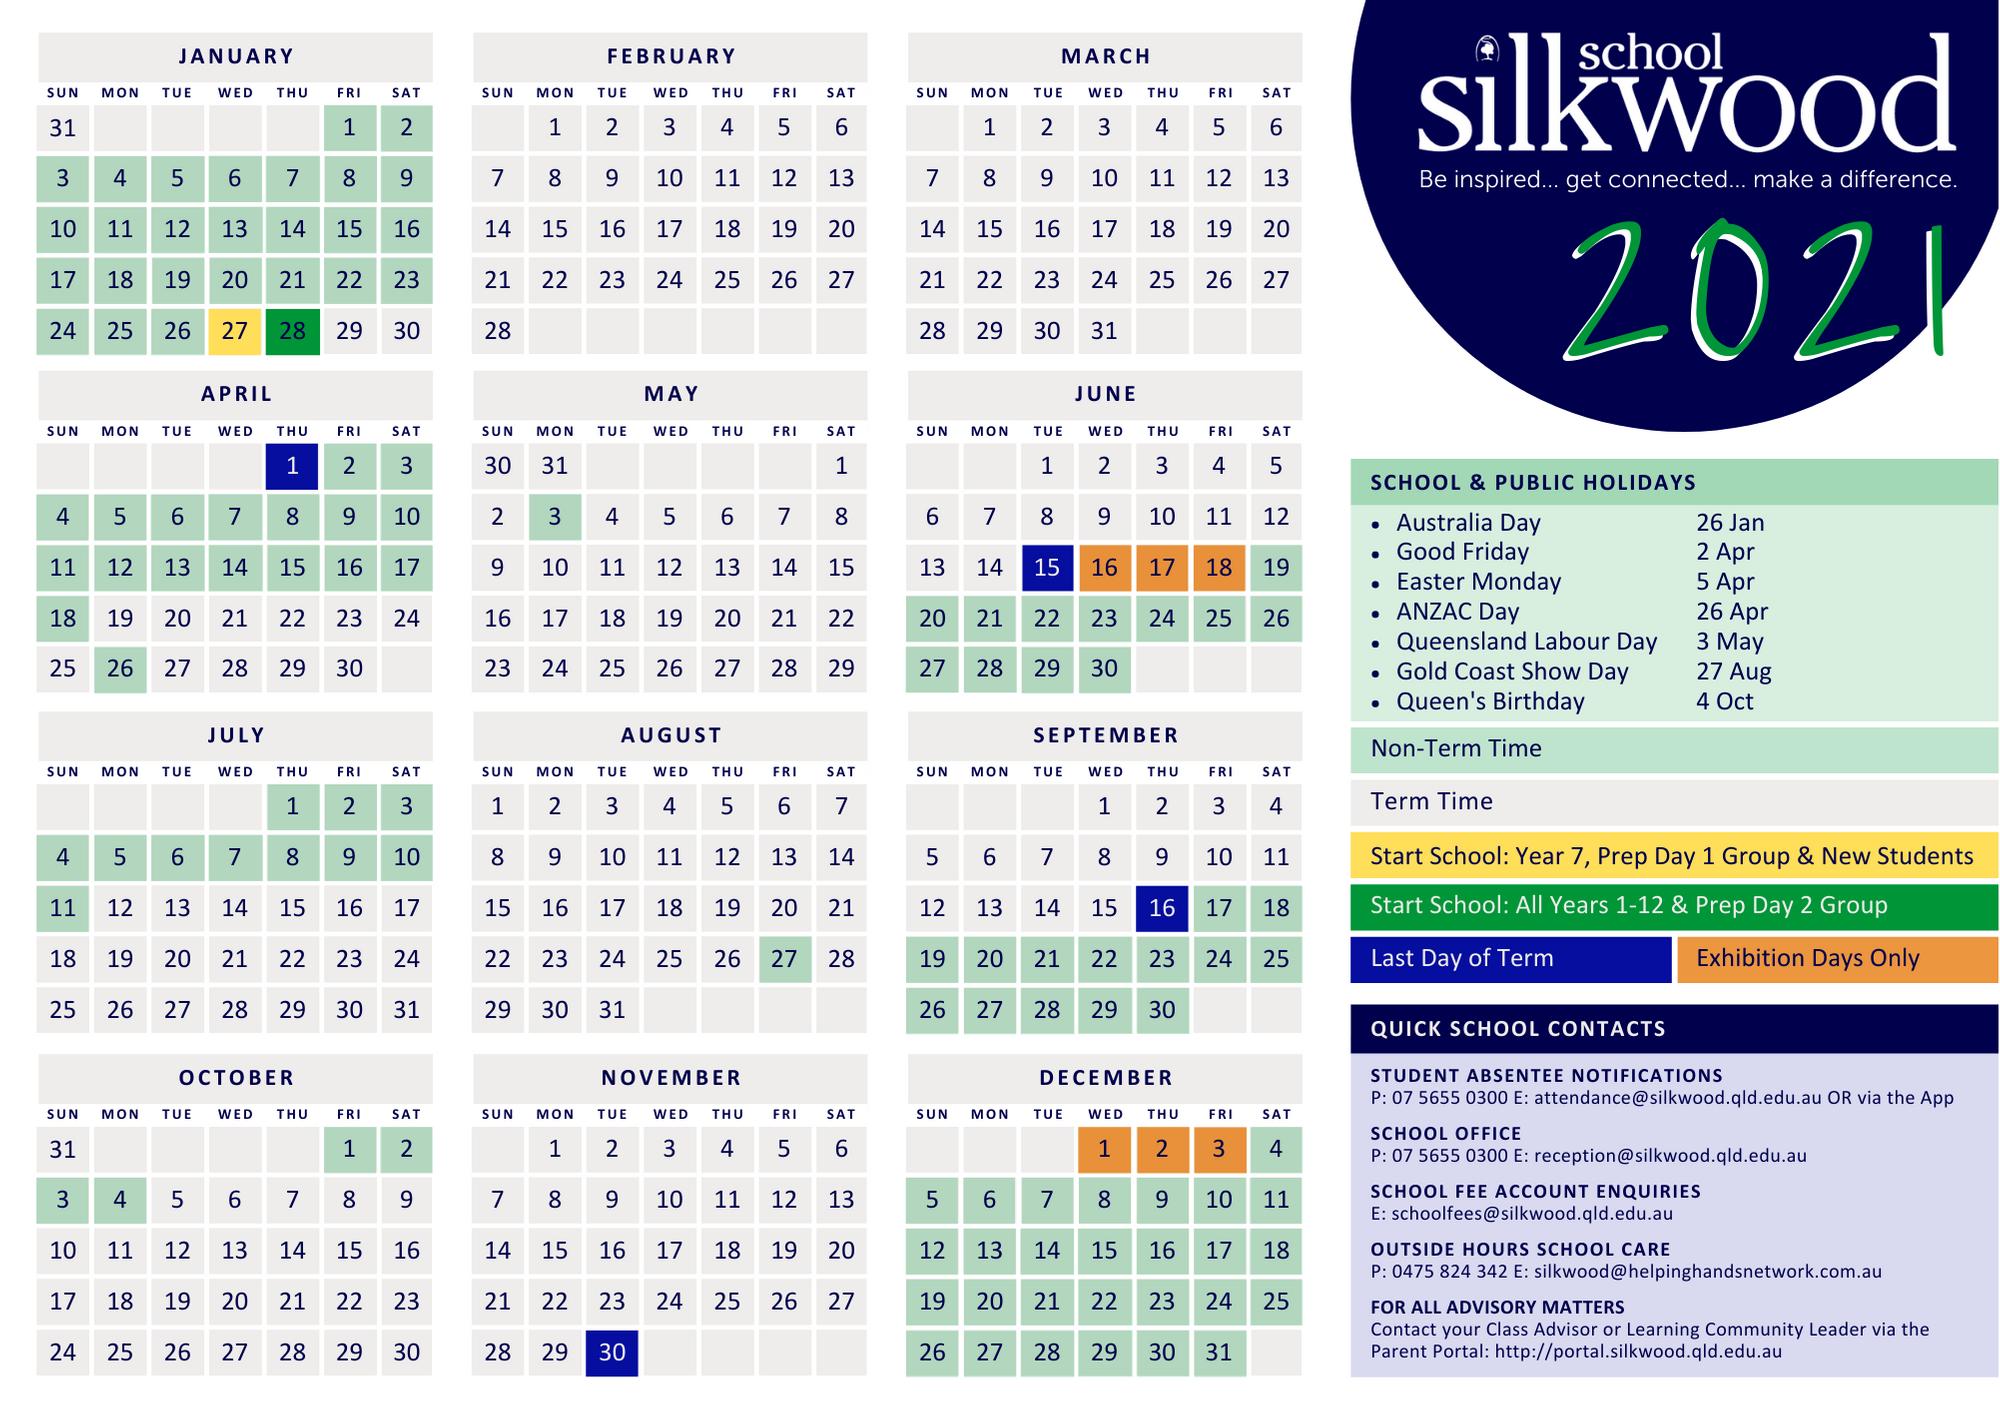 2021 Silkwood School Calendar